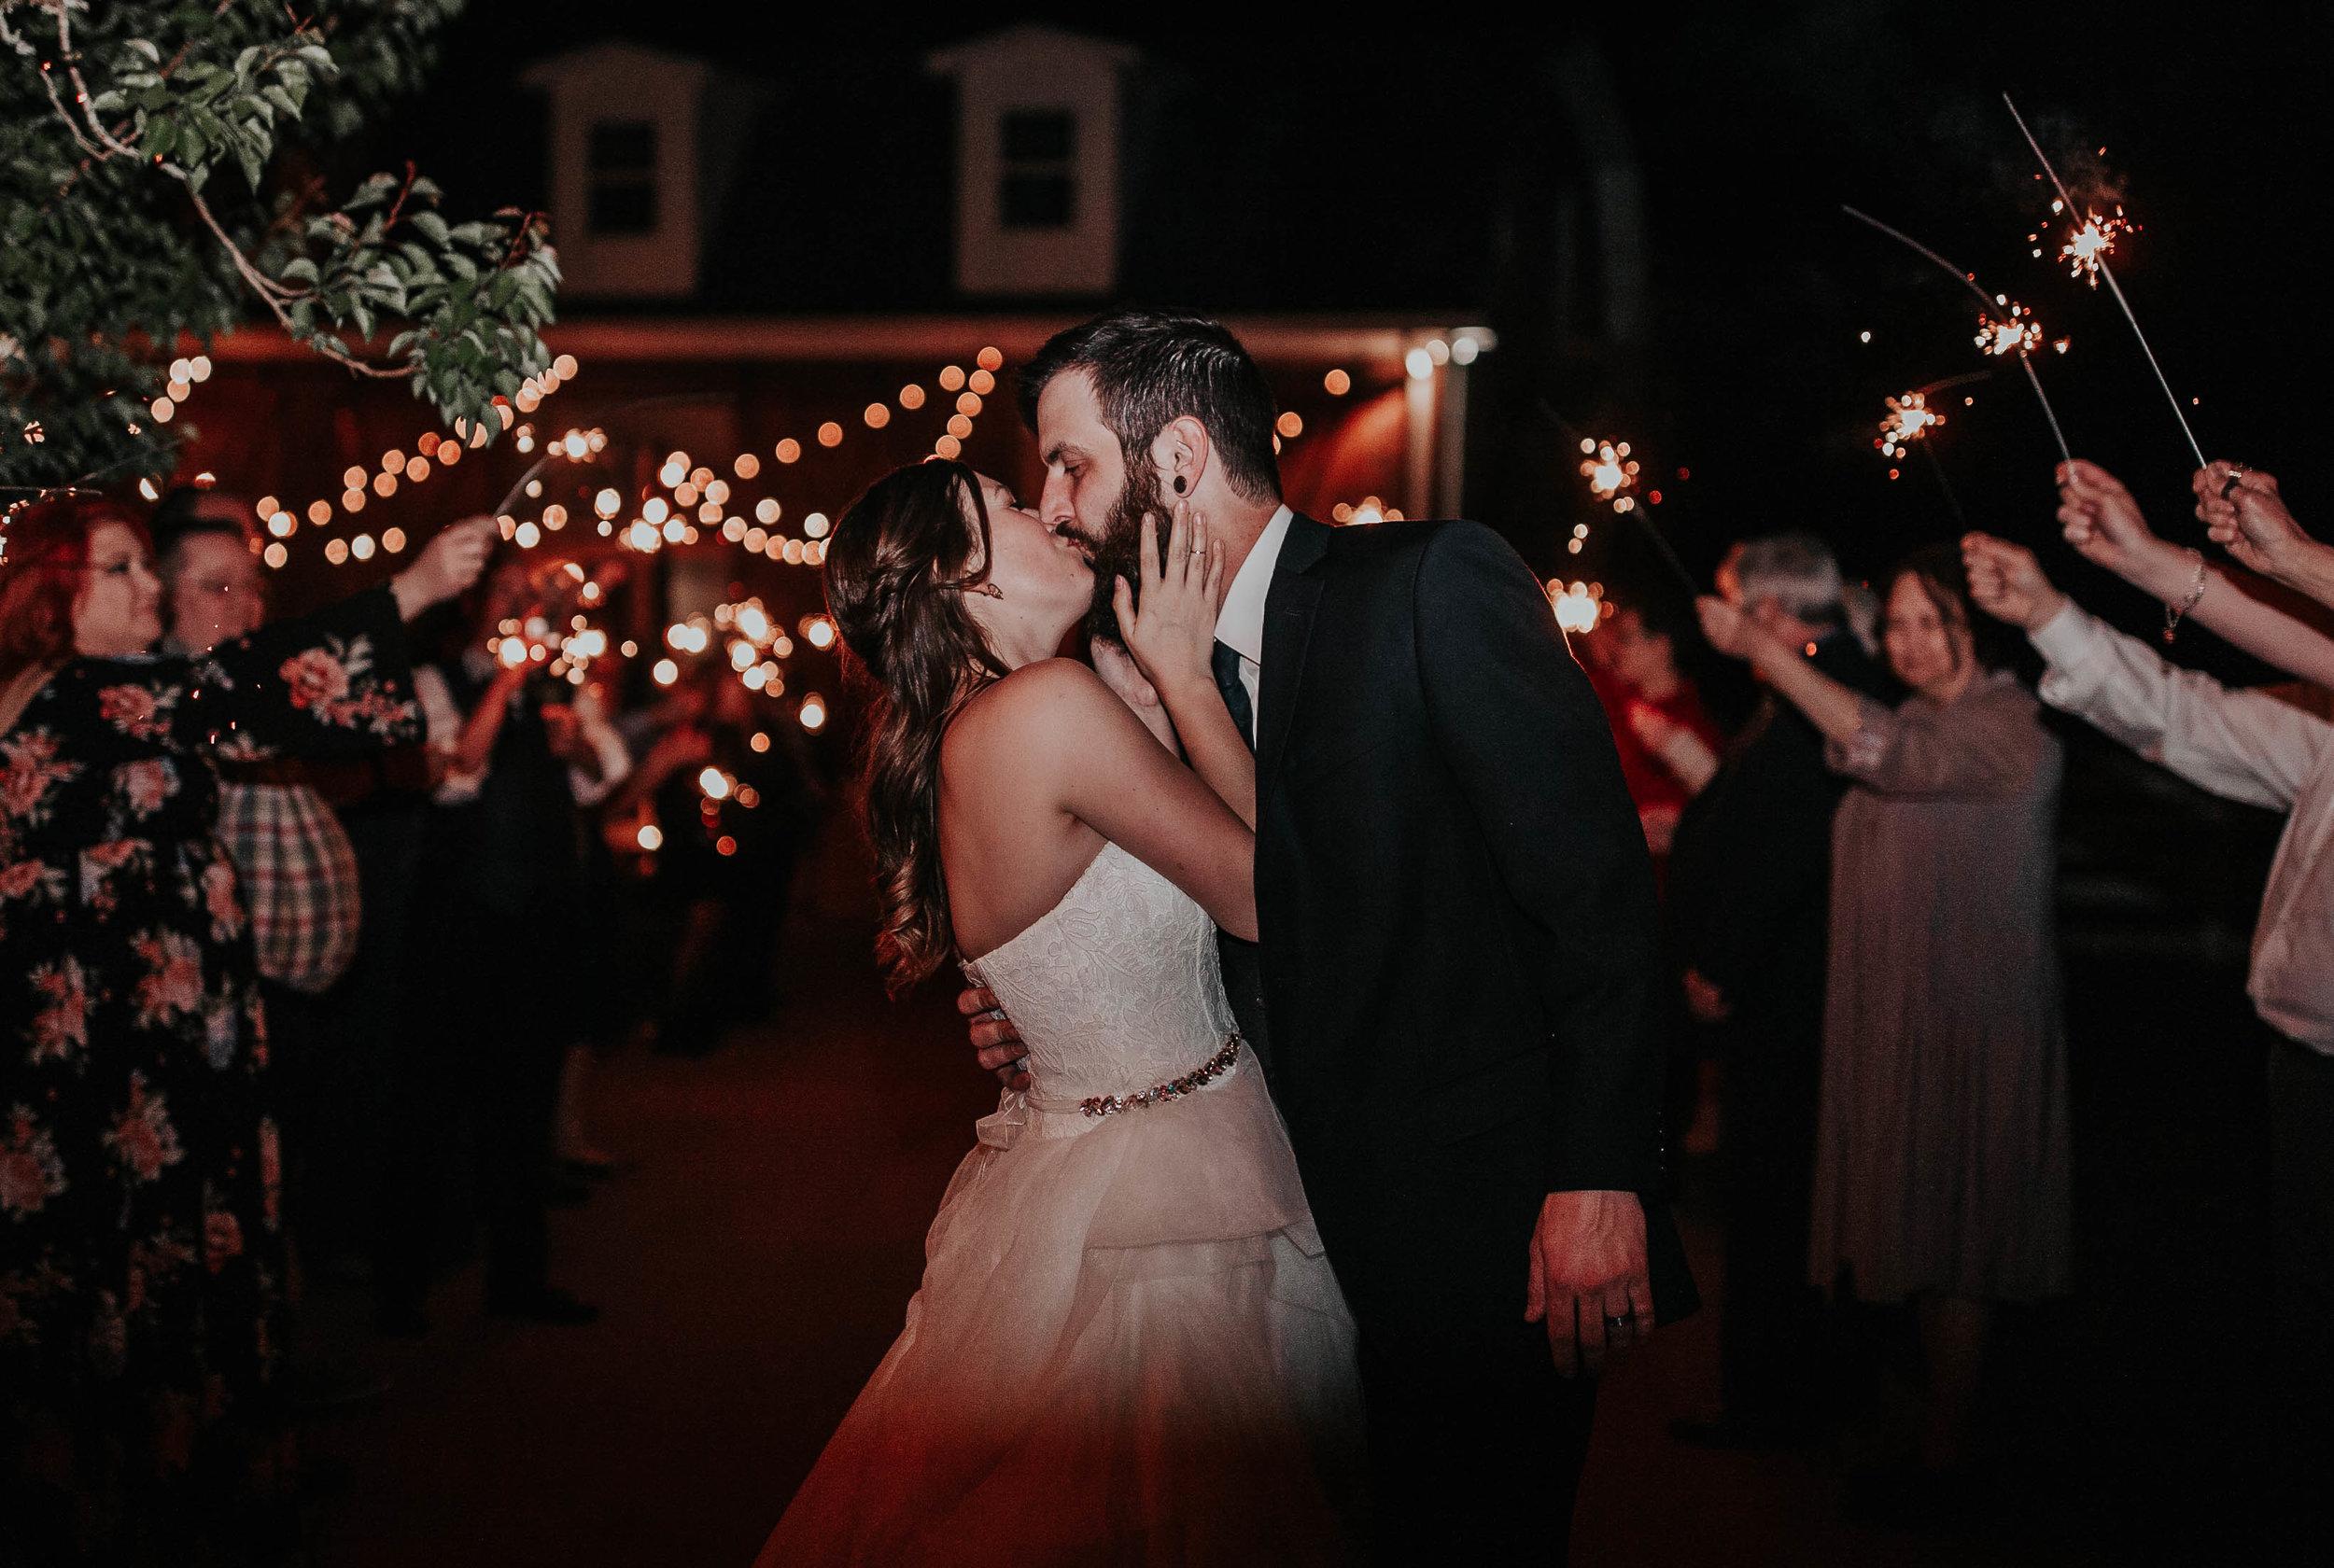 Adam_and_Hannah_Wedding_CharisLauren__6355-2.jpg